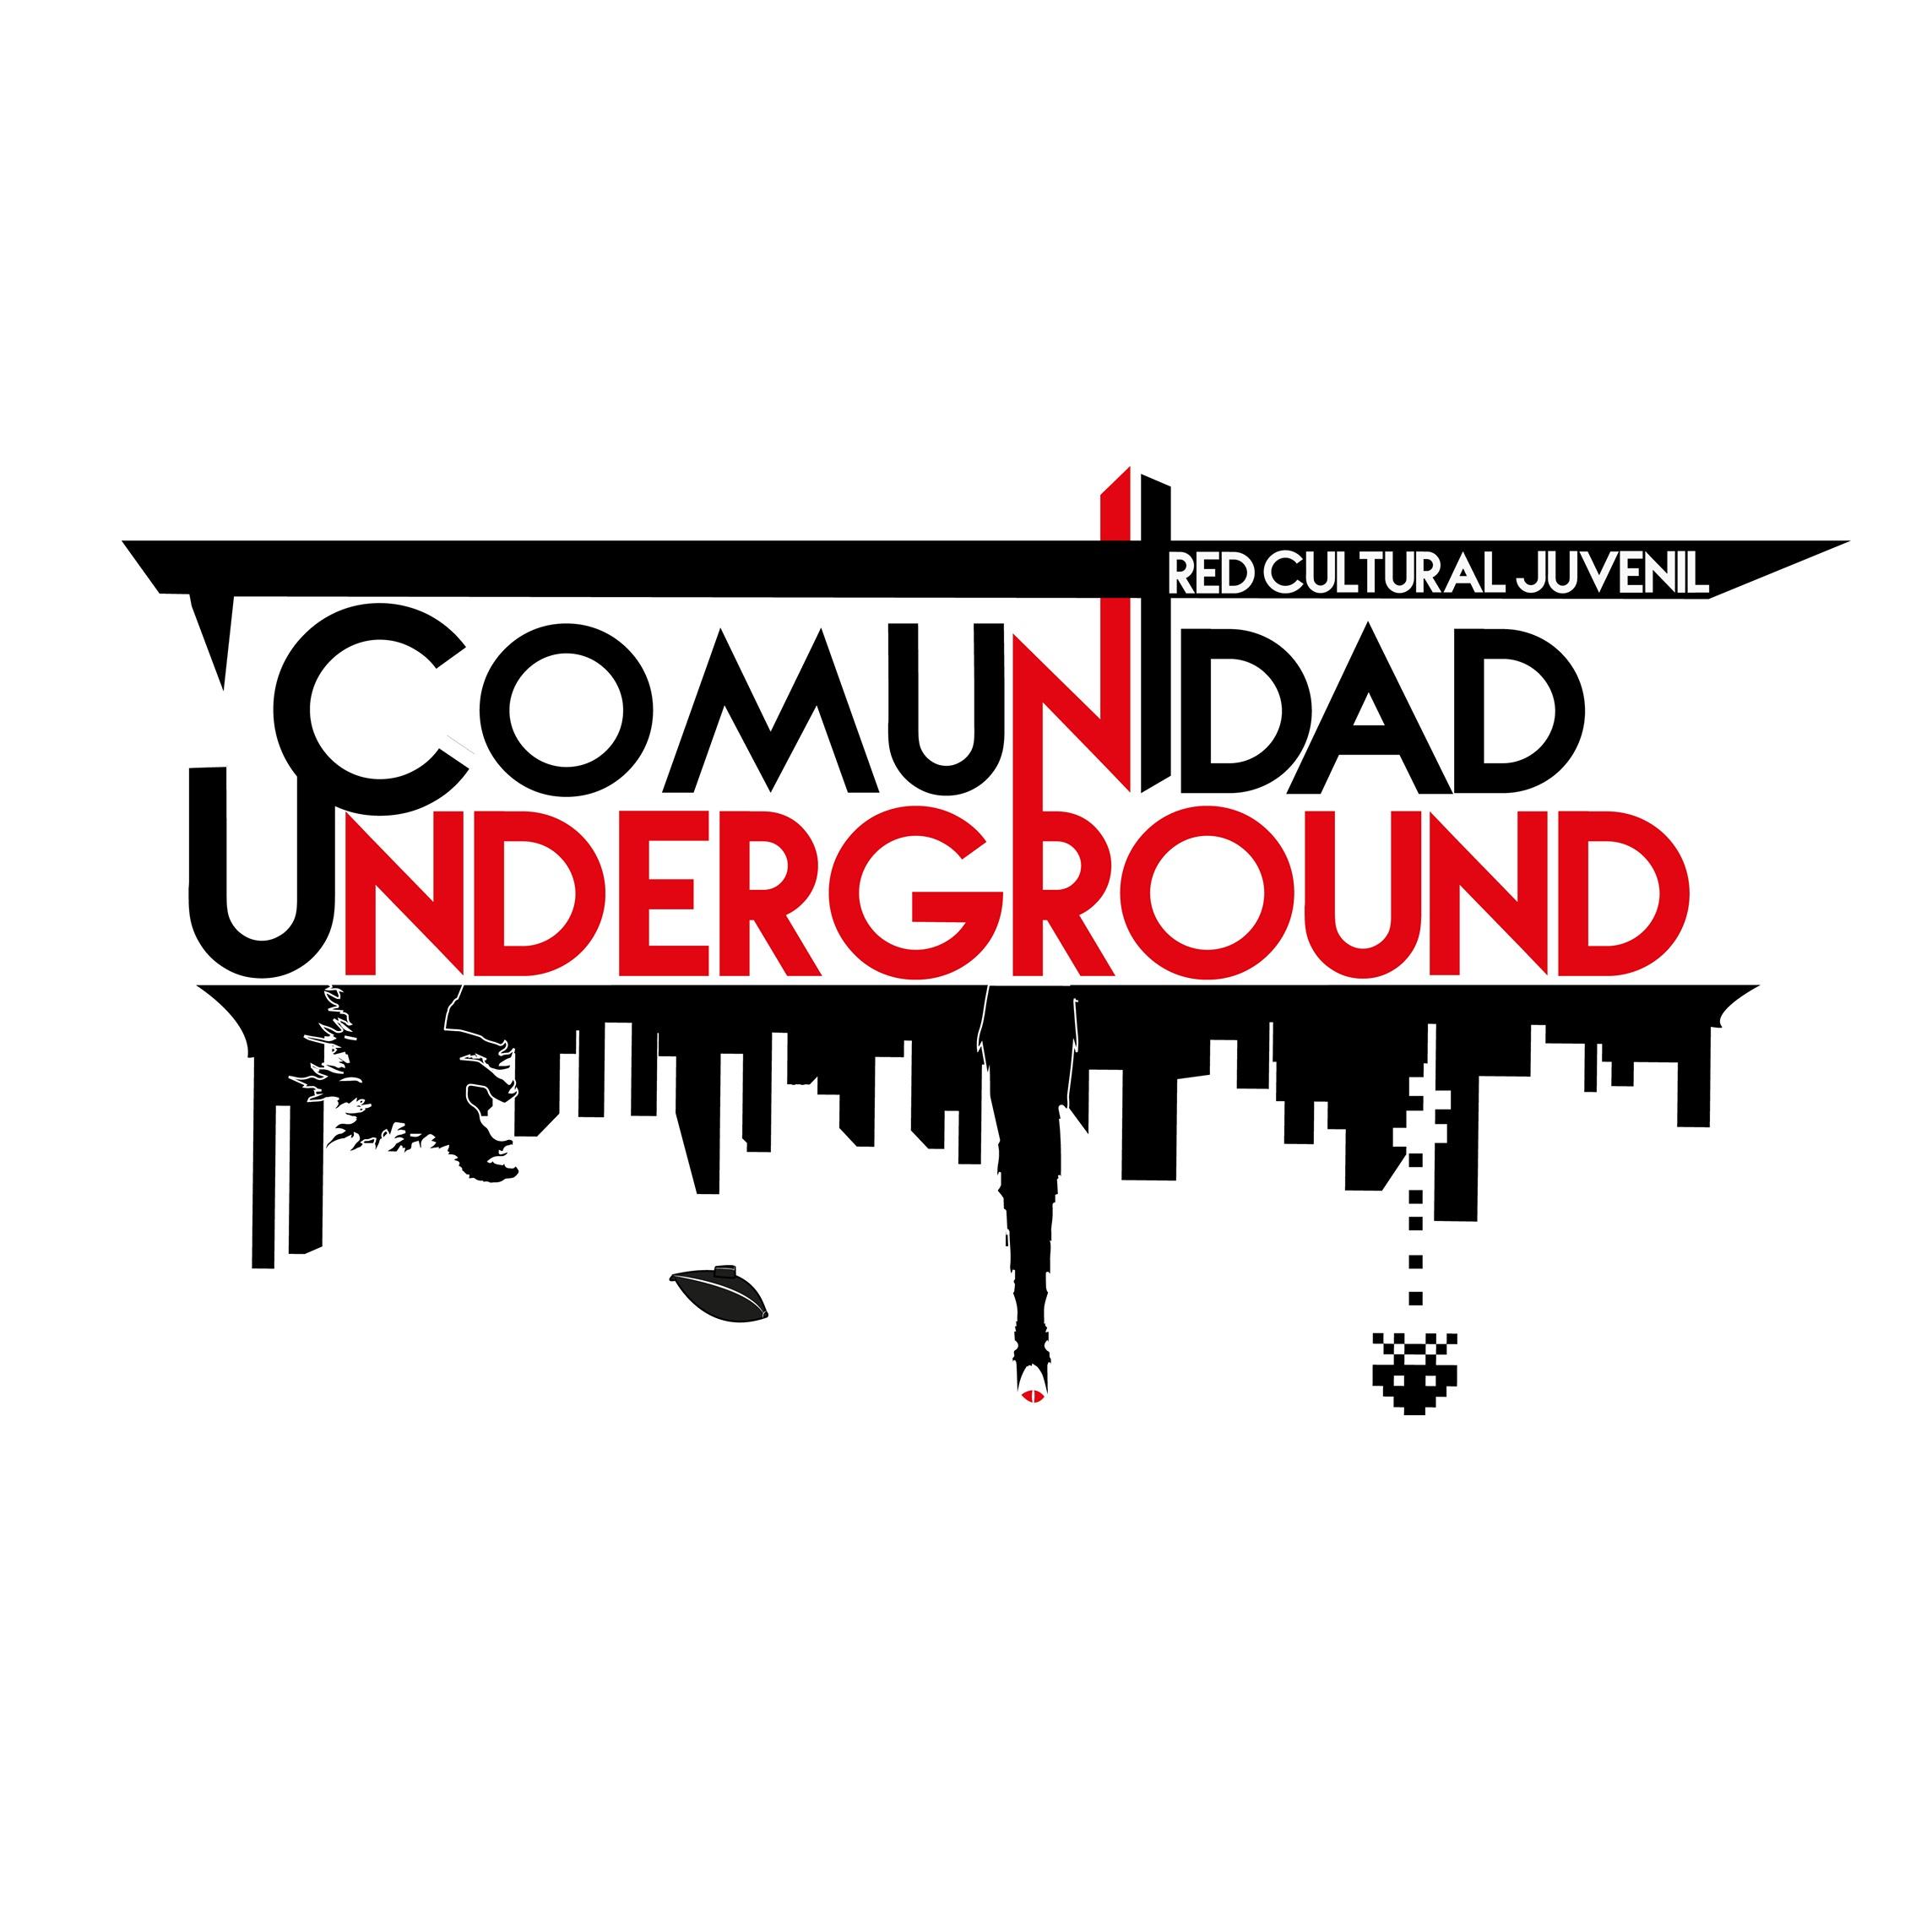 Red Cultural Juvenil Comunidad Underground